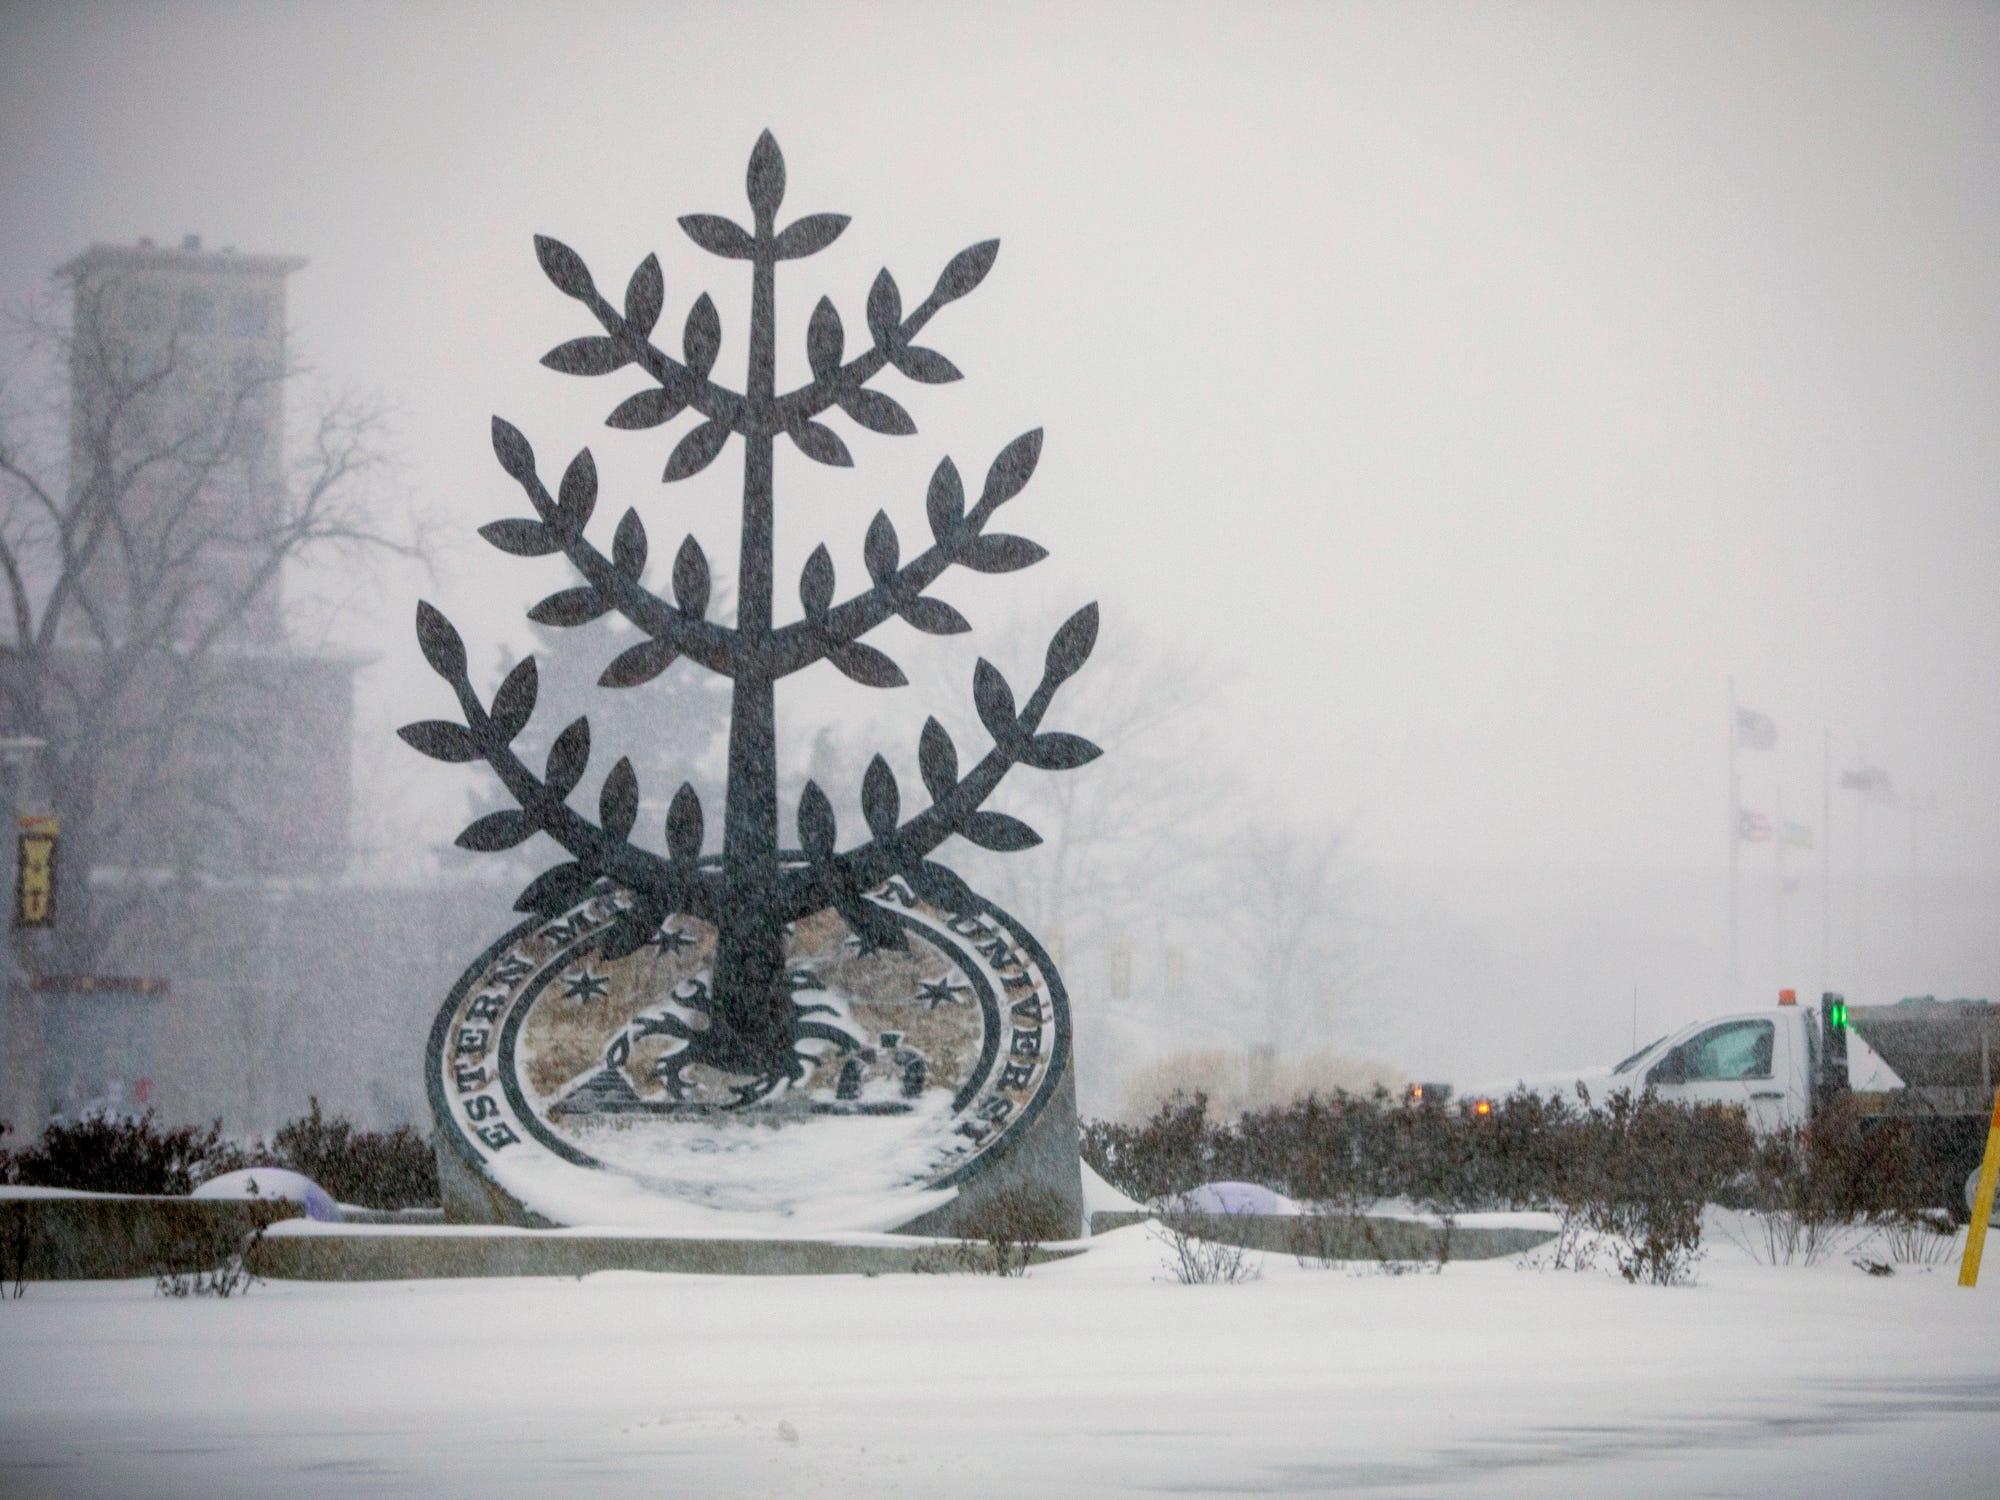 Snow falls on the campus of Western Michigan University in Kalamazoo, Monday.